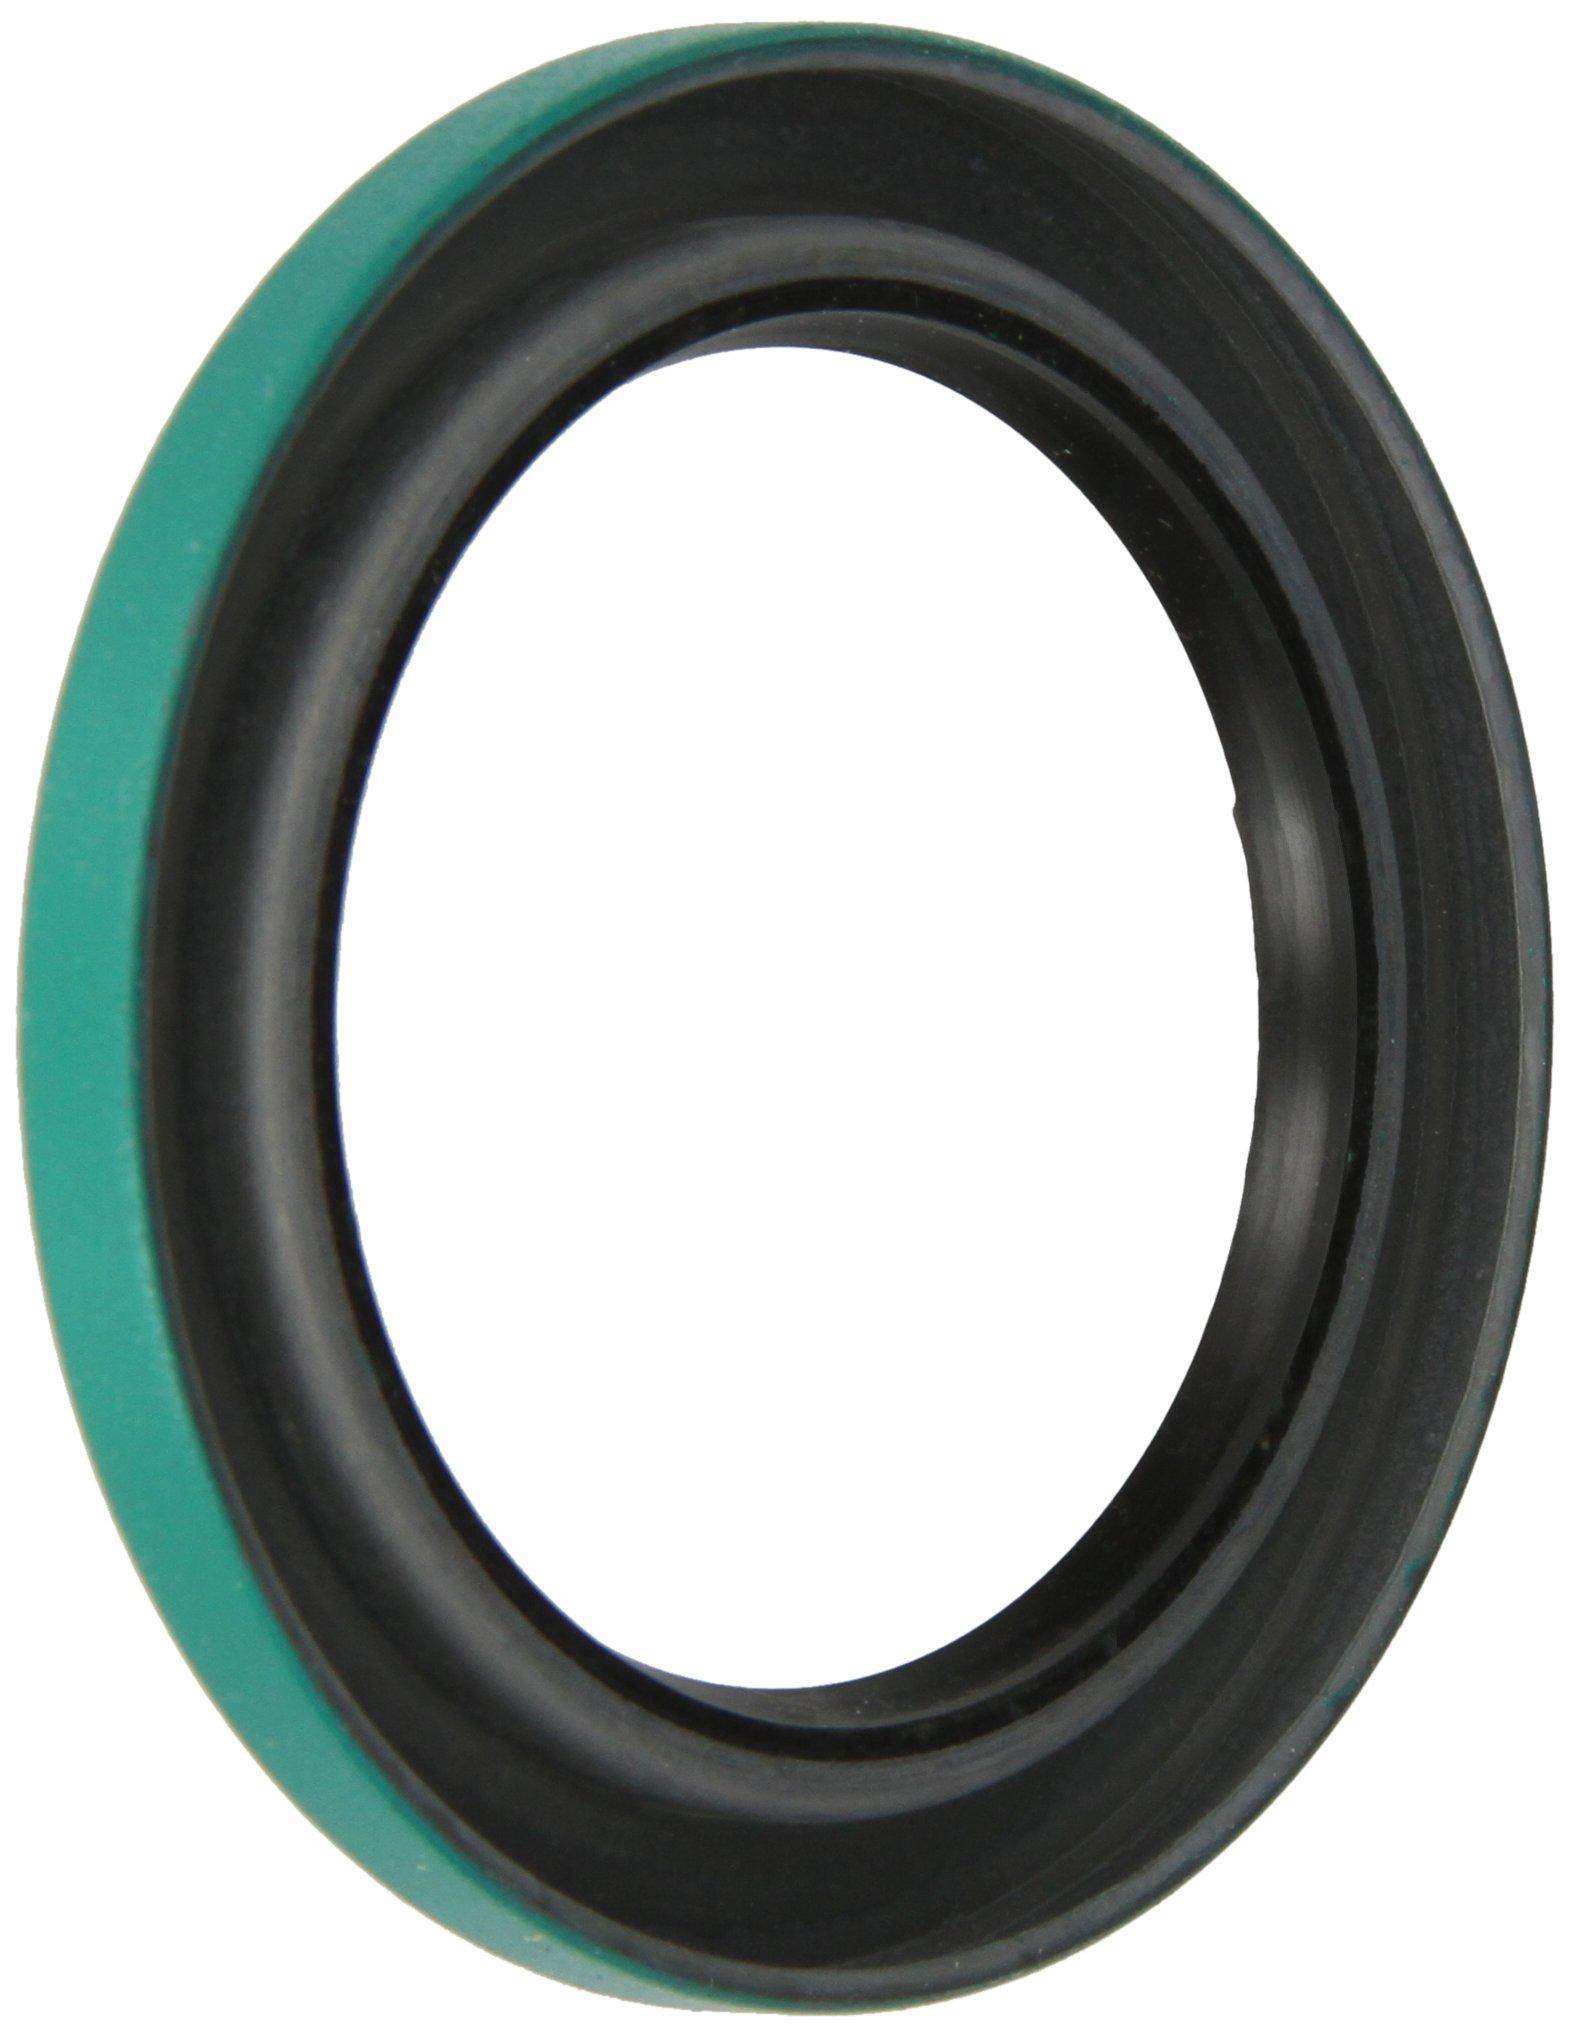 SKF 19880 LDS & Small Bore Seal, R Lip Code, HM21 Style, Inch, 2'' Shaft Diameter, 2.875'' Bore Diameter, 0.25'' Width